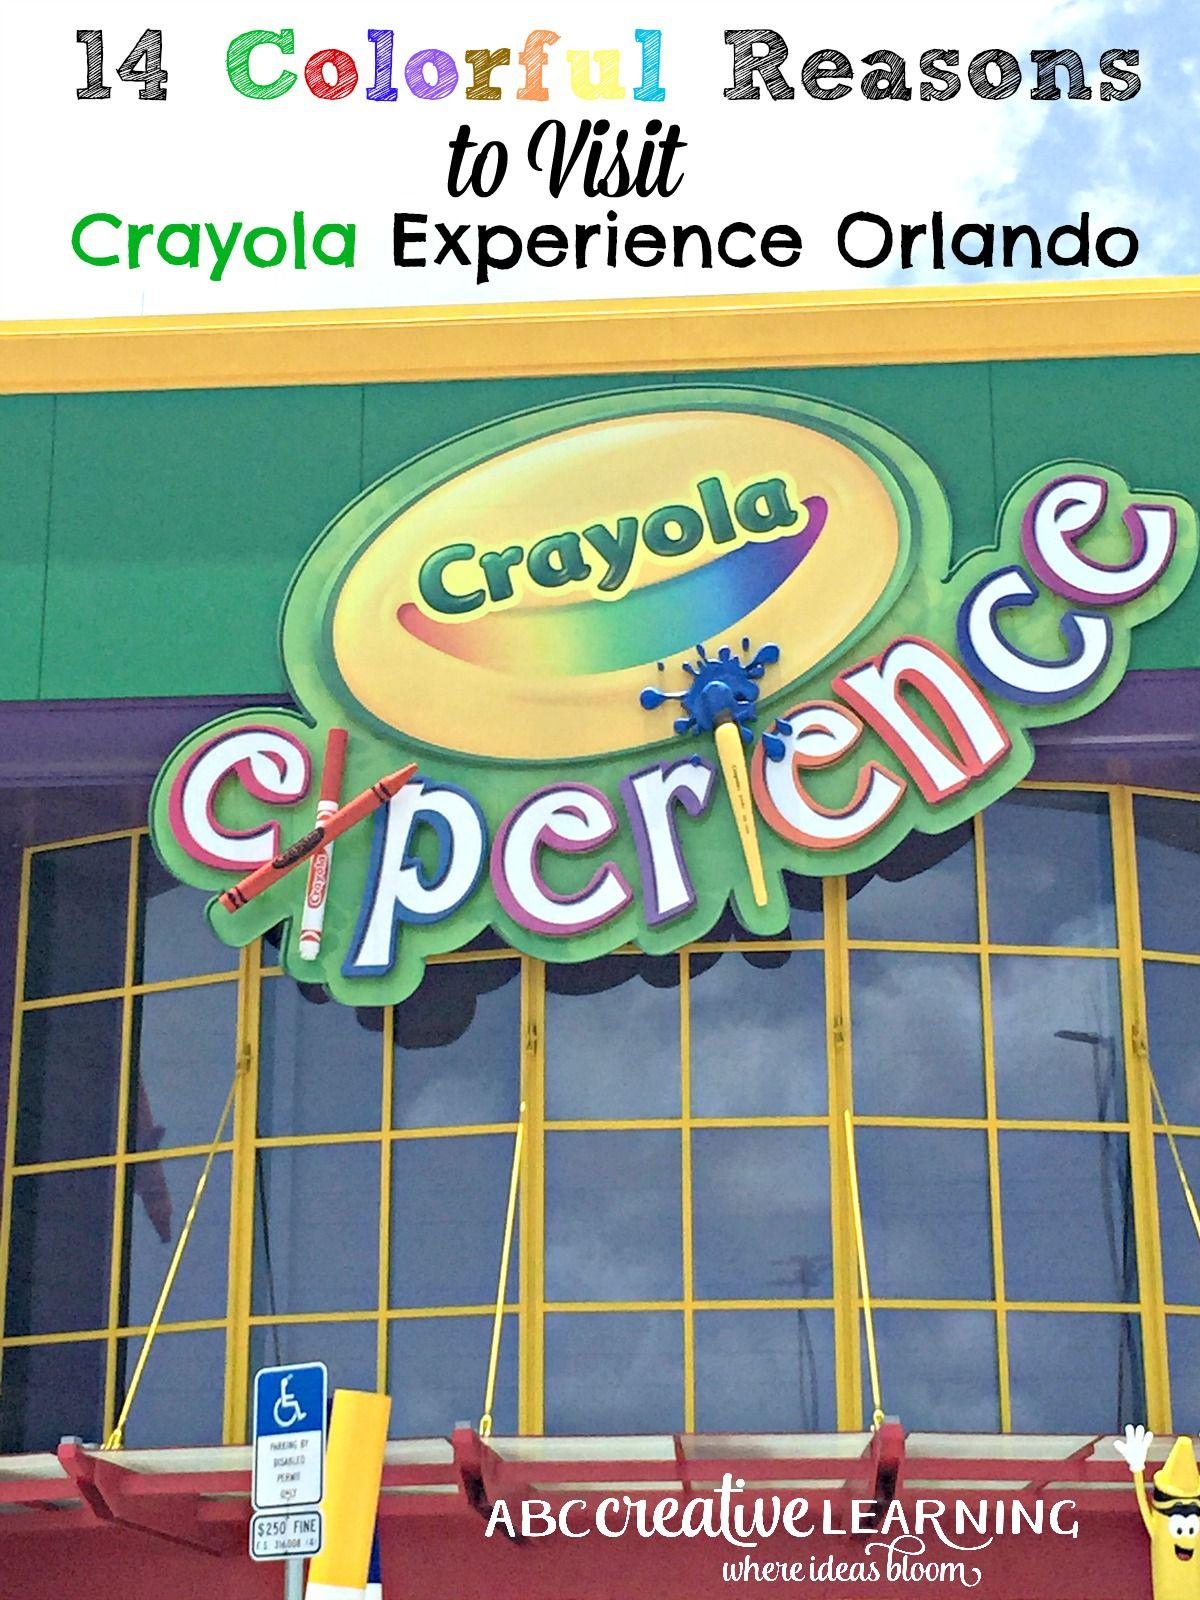 Crayola experience orlando coupons